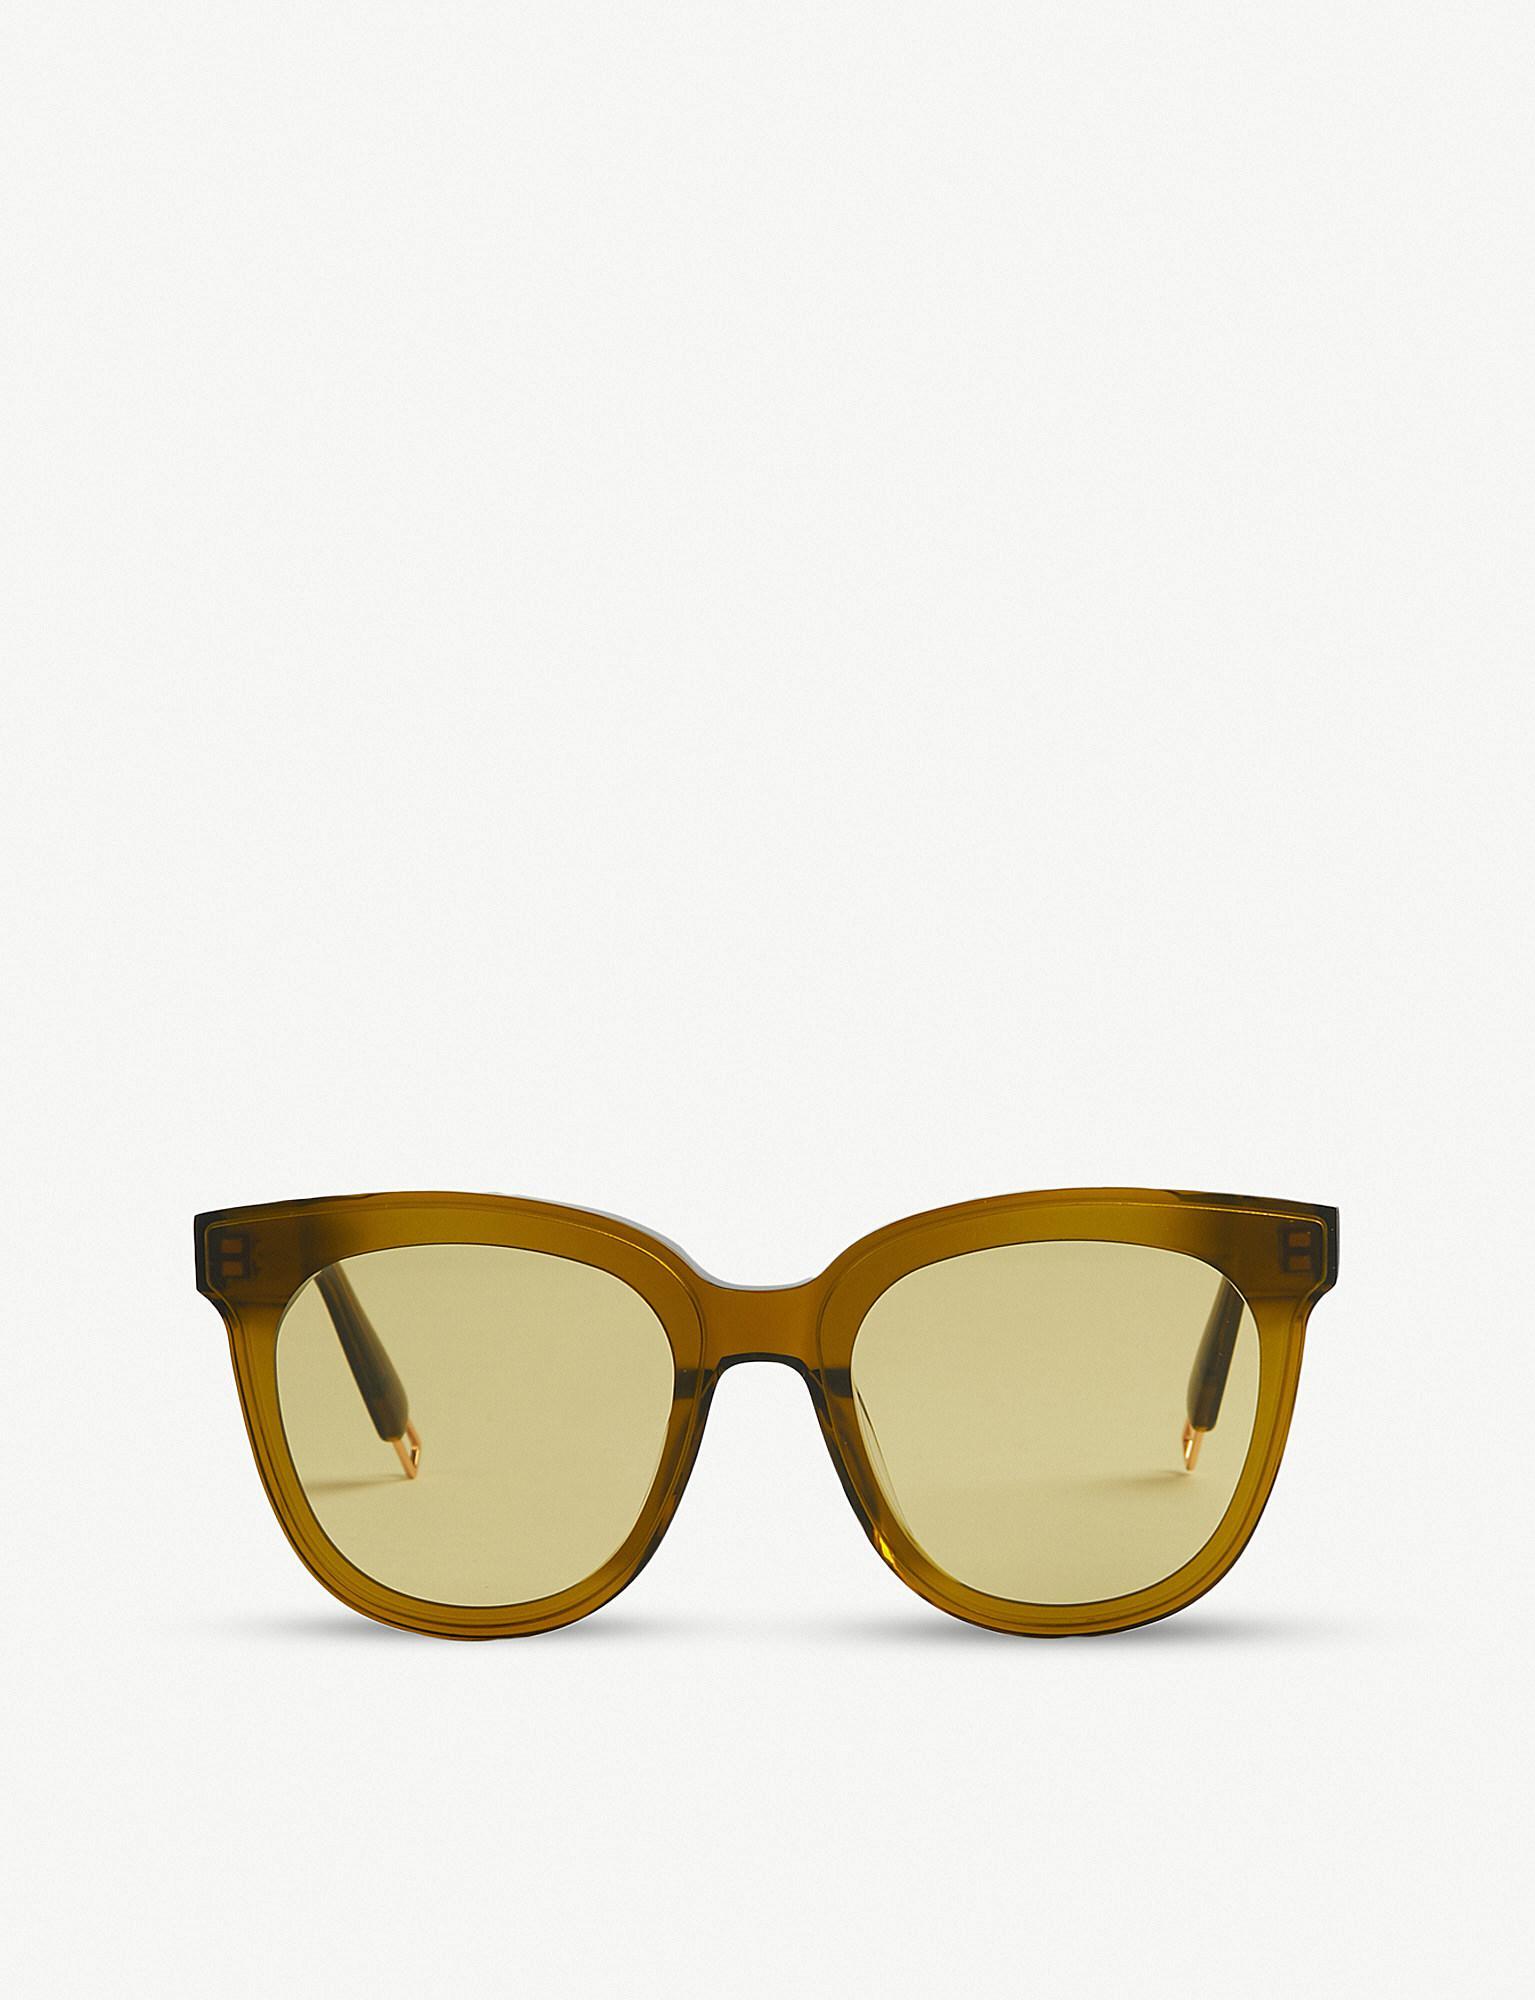 cb65031c77a Lyst - Gentle Monster Inscarlet Acetate Sunglasses for Men